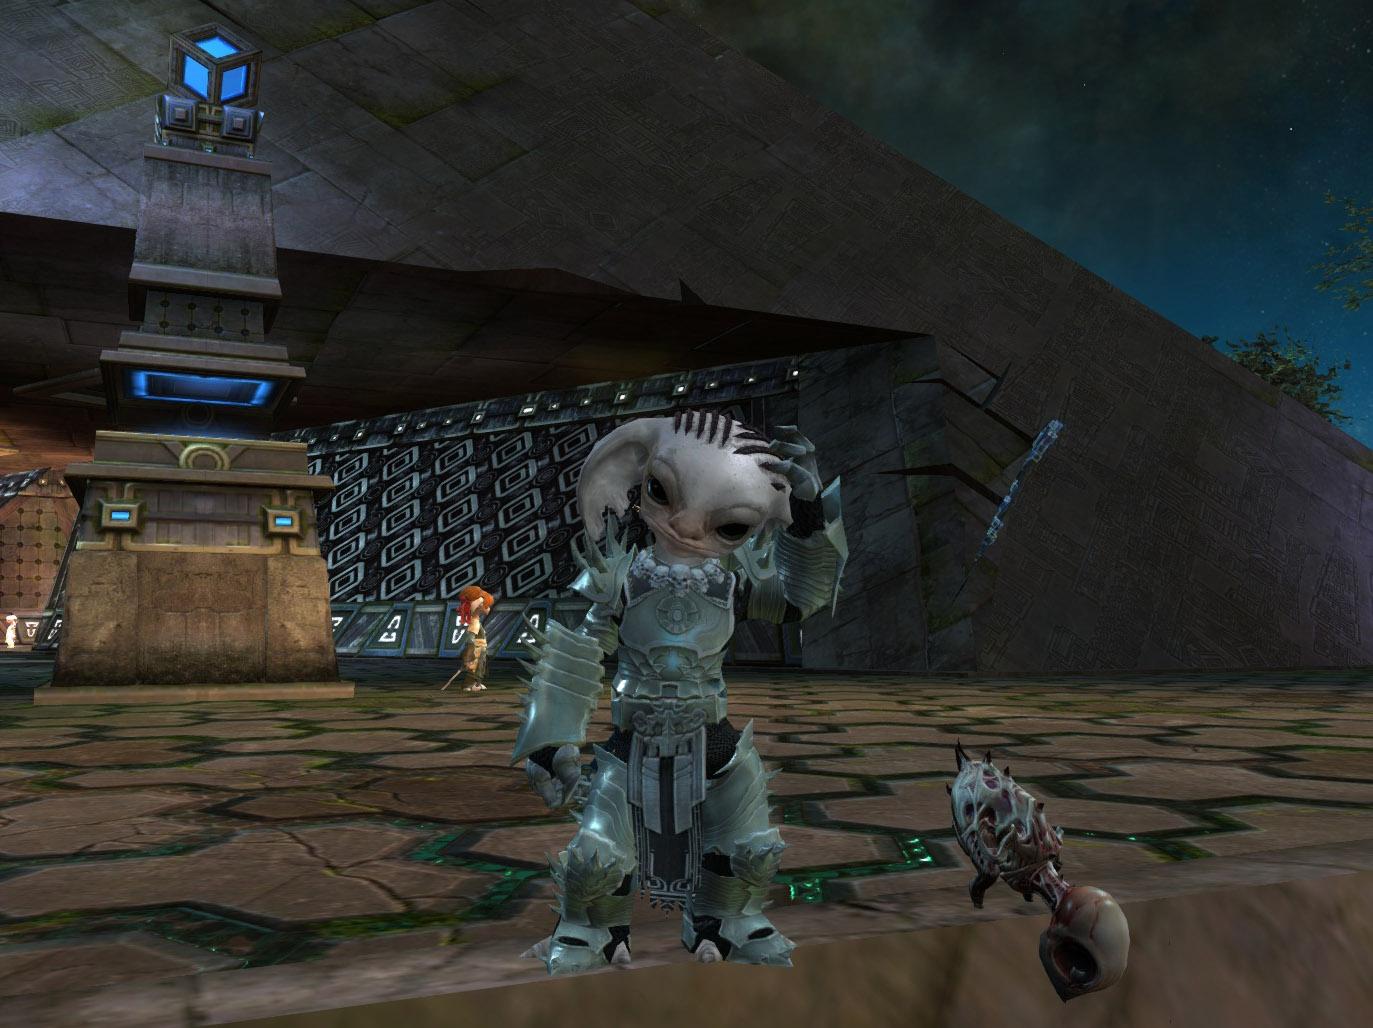 Guild wars 2 gw2 darkened desires gw2 fashion - Winterkarma1